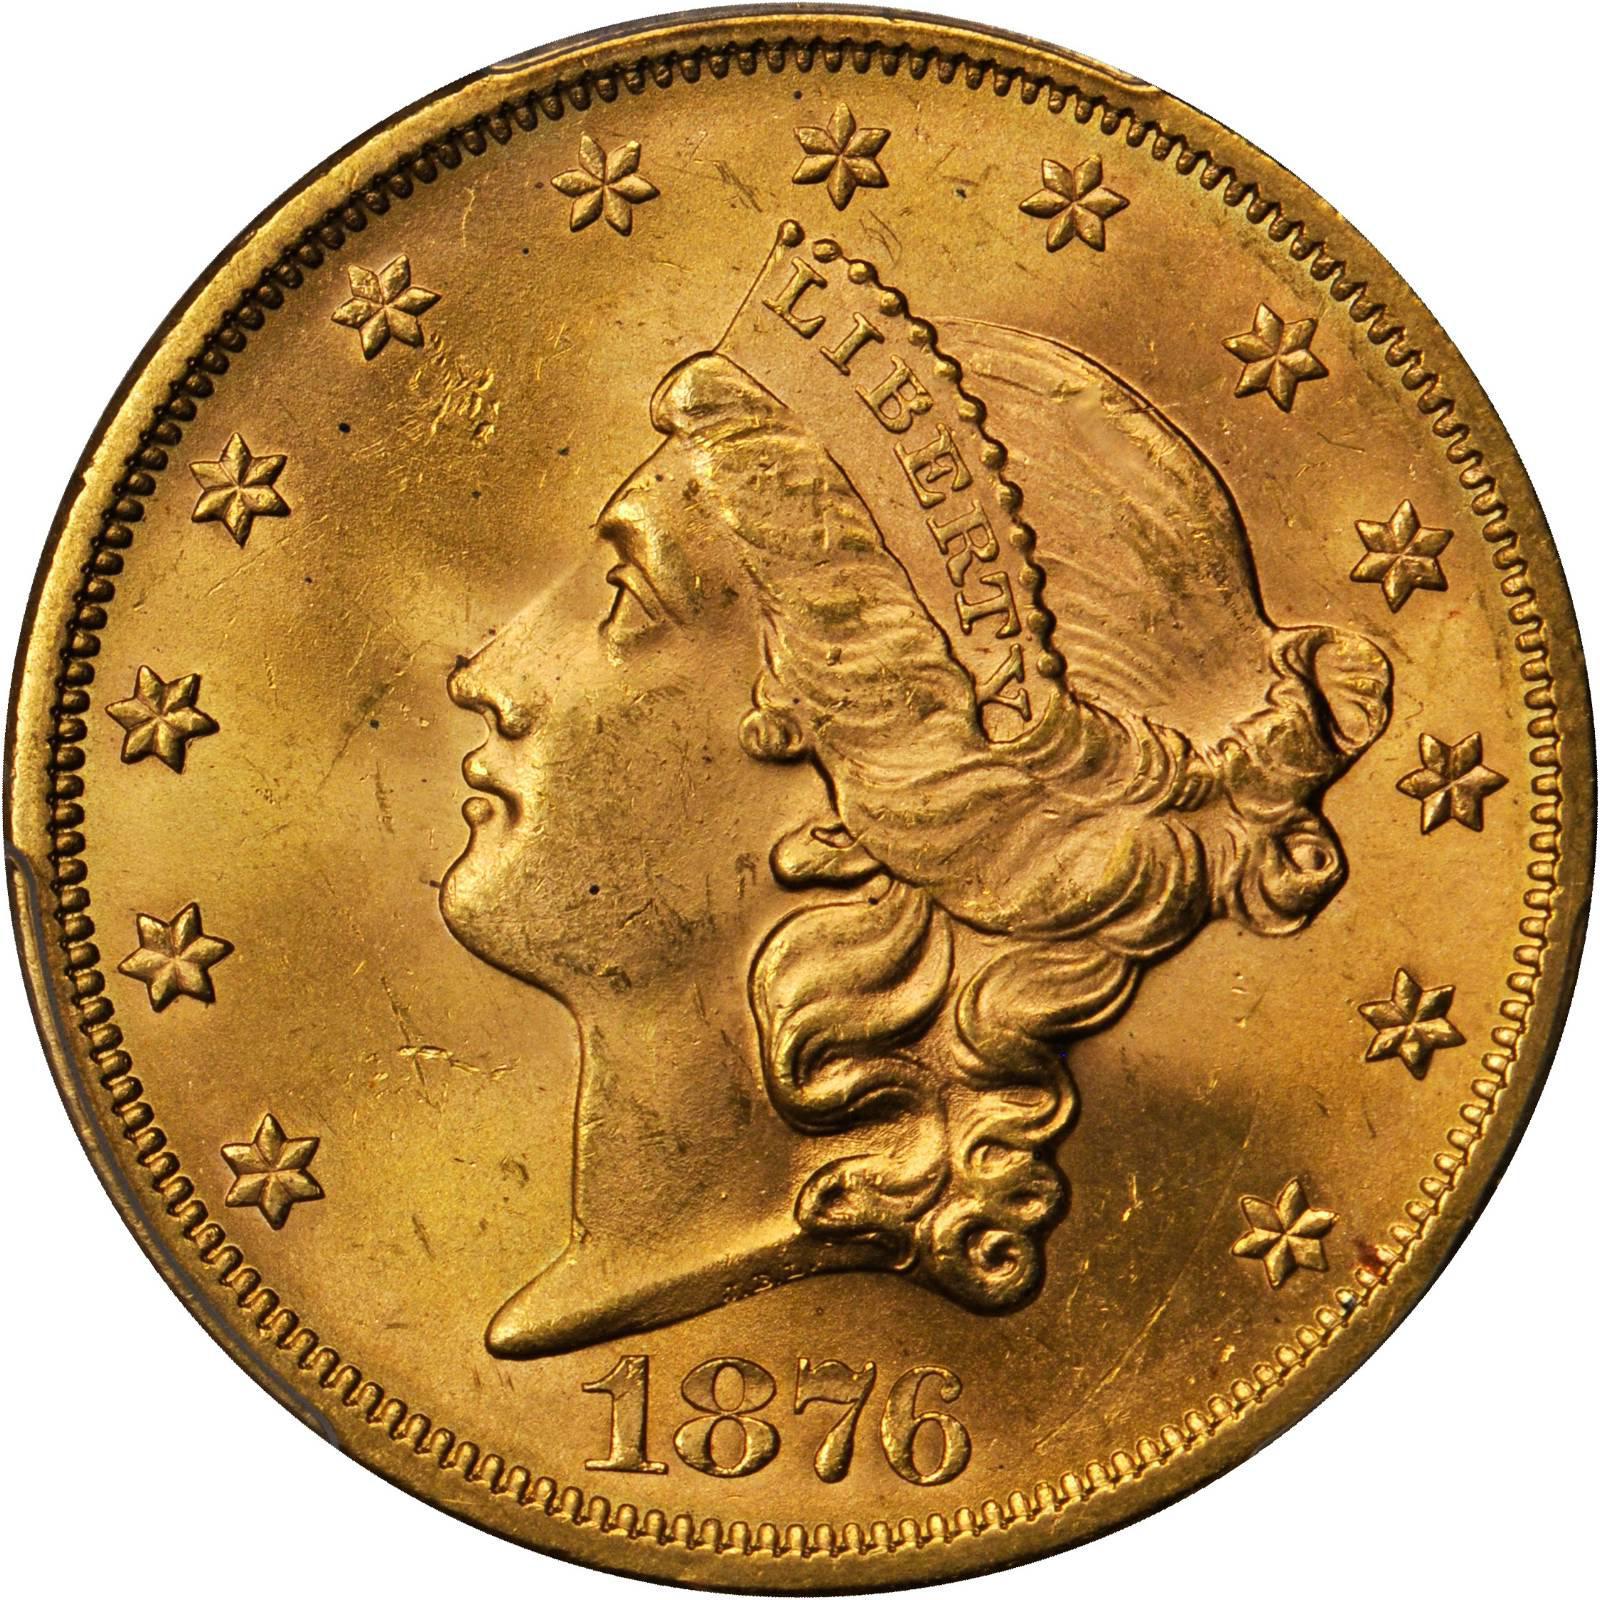 coins doubler